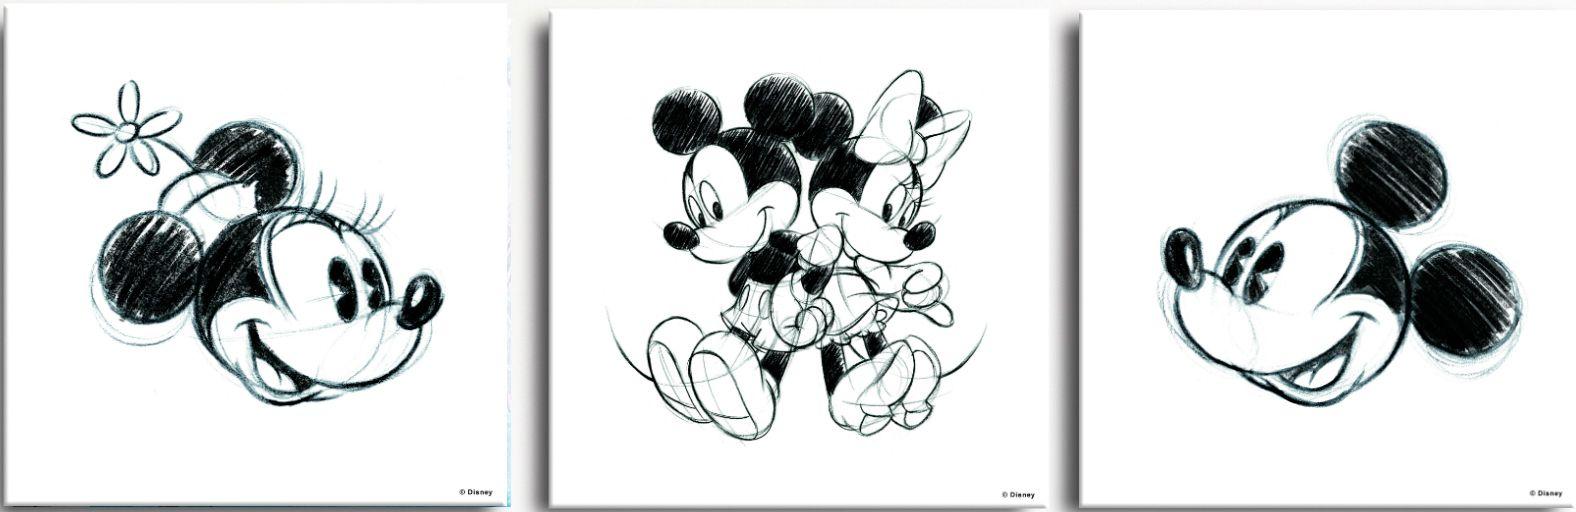 GRAHAM BROWN GRAHAM & BROWN Leinwand »Leinwandbild Mickey & Minnie Sketches, 3-er Set«